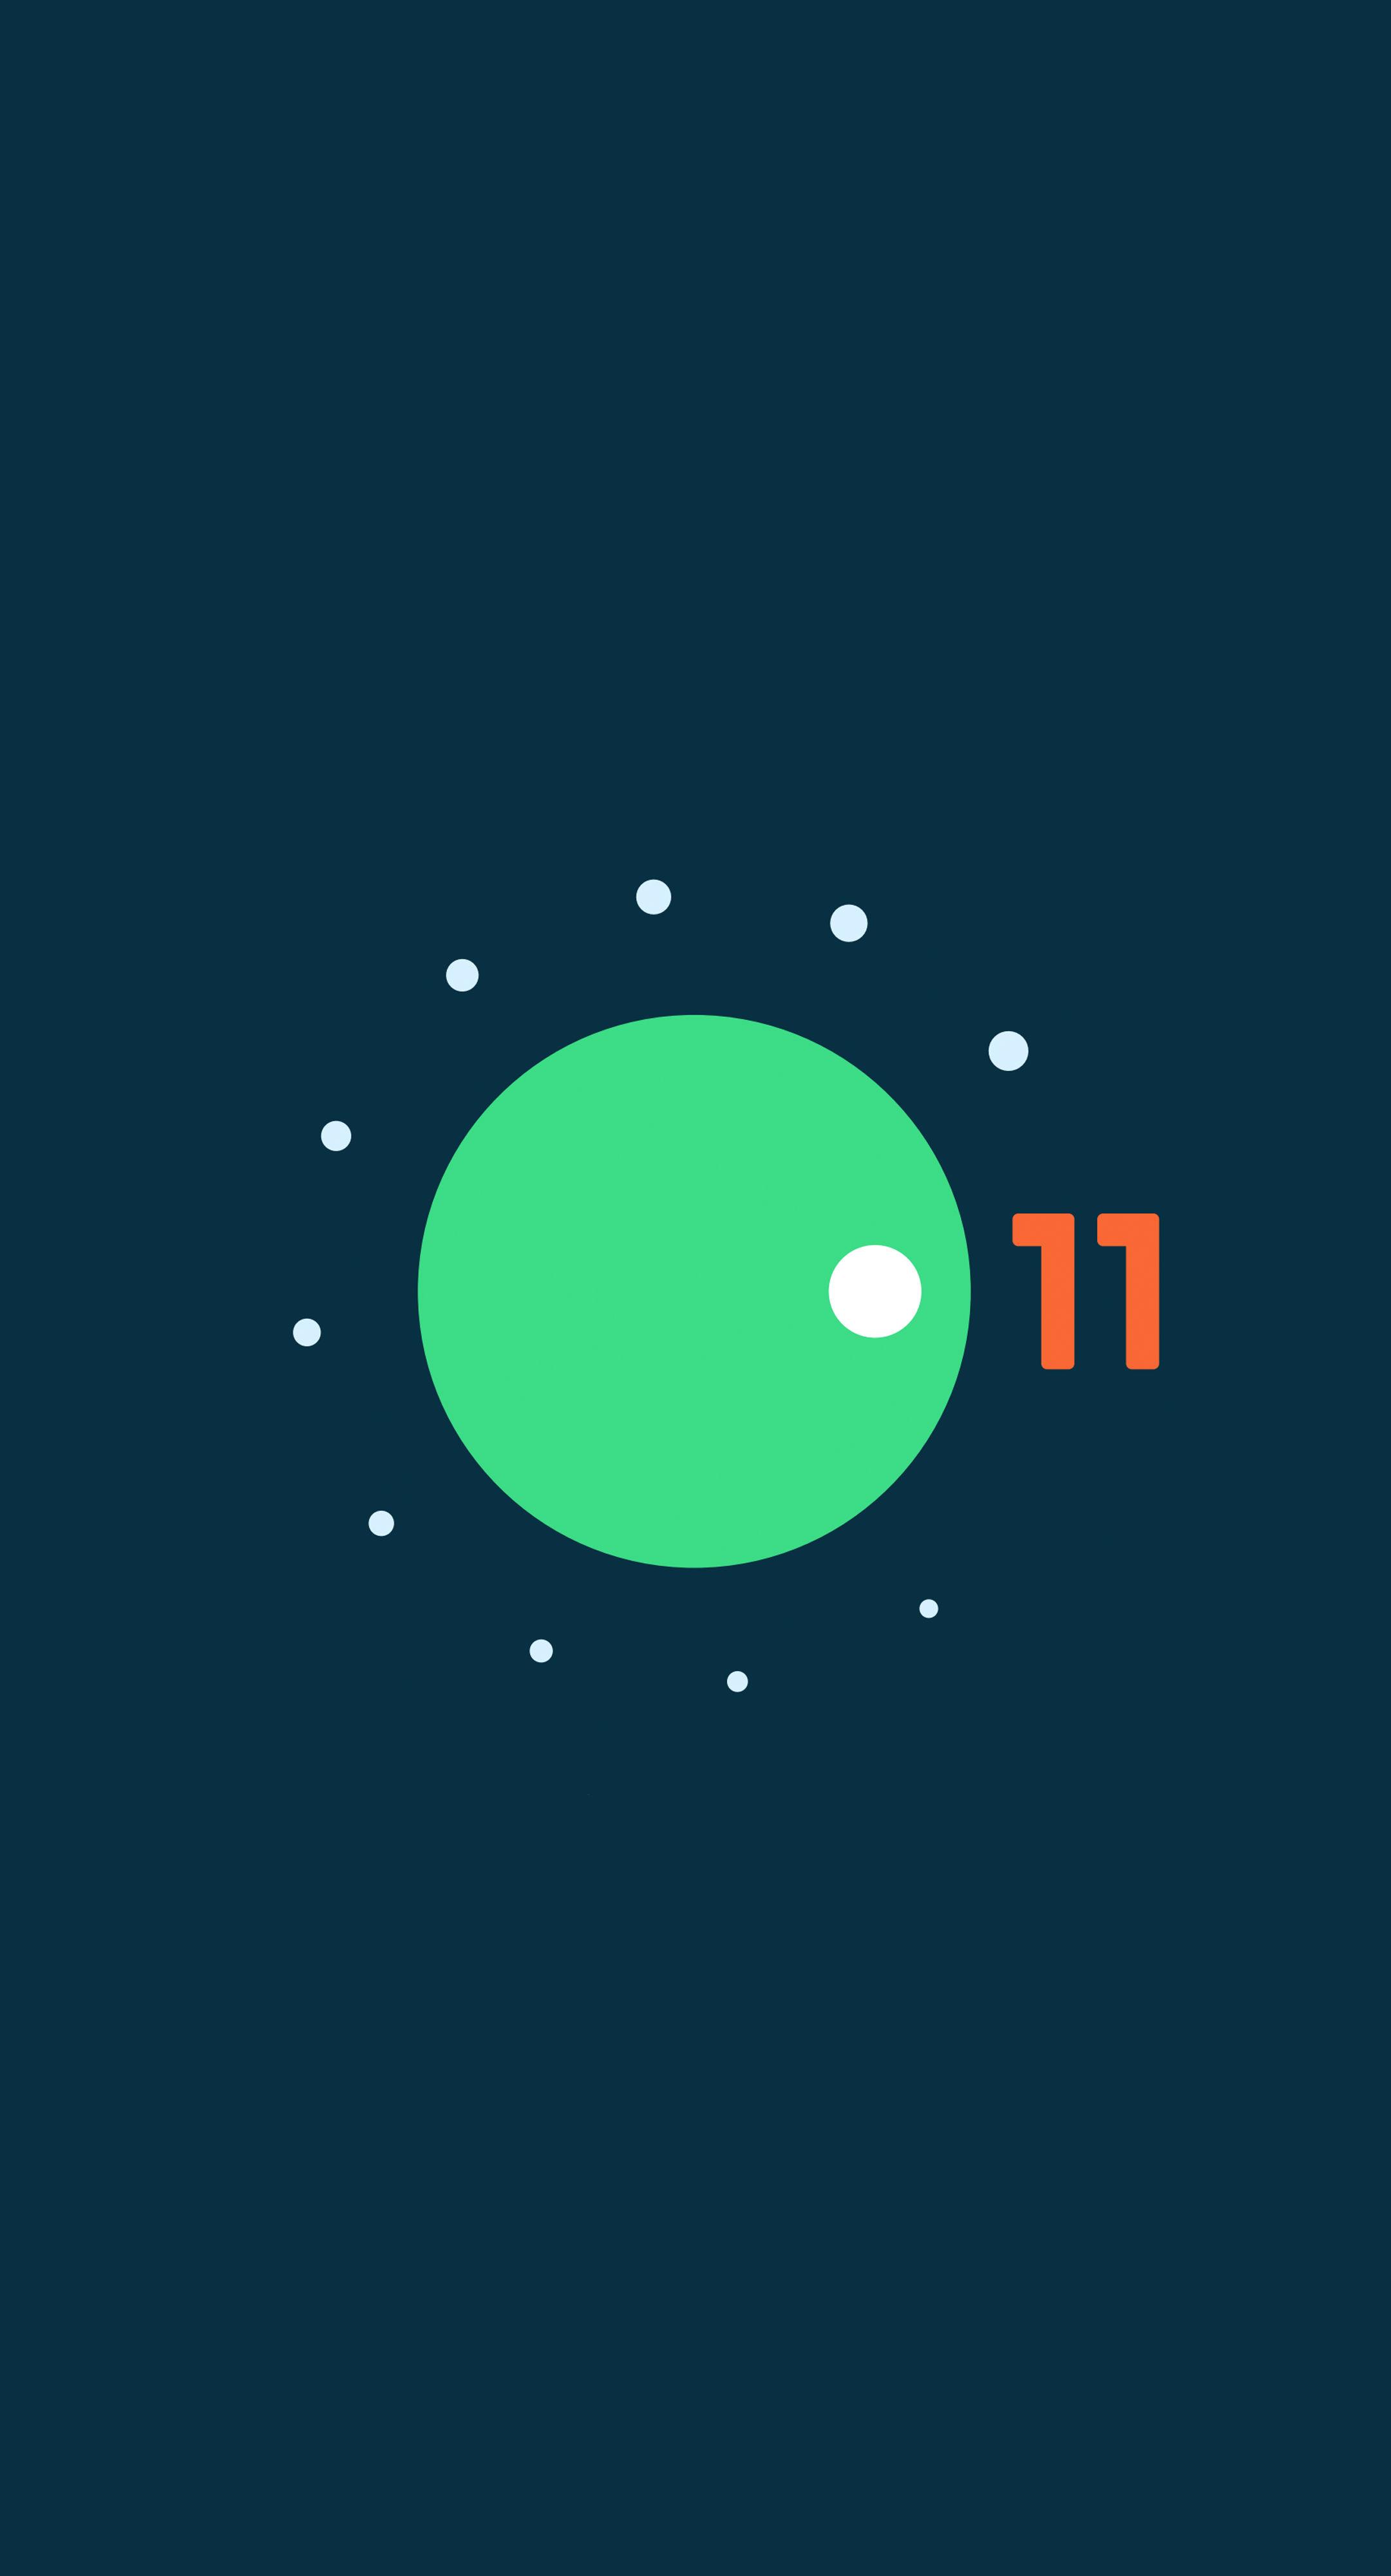 android-11-logo-navy